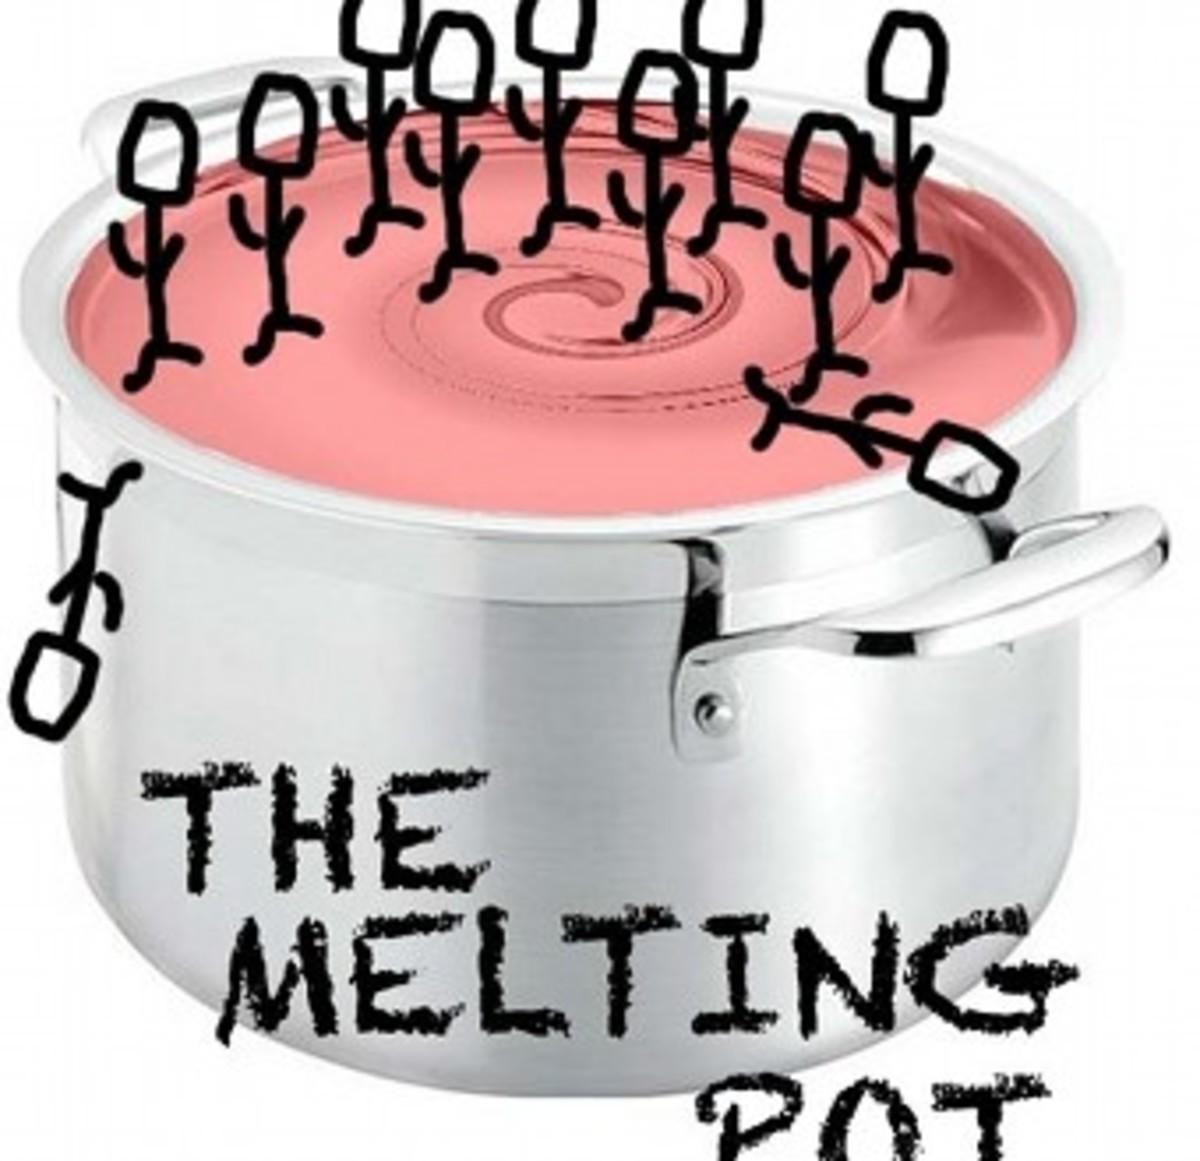 The Melting Pot of Crime